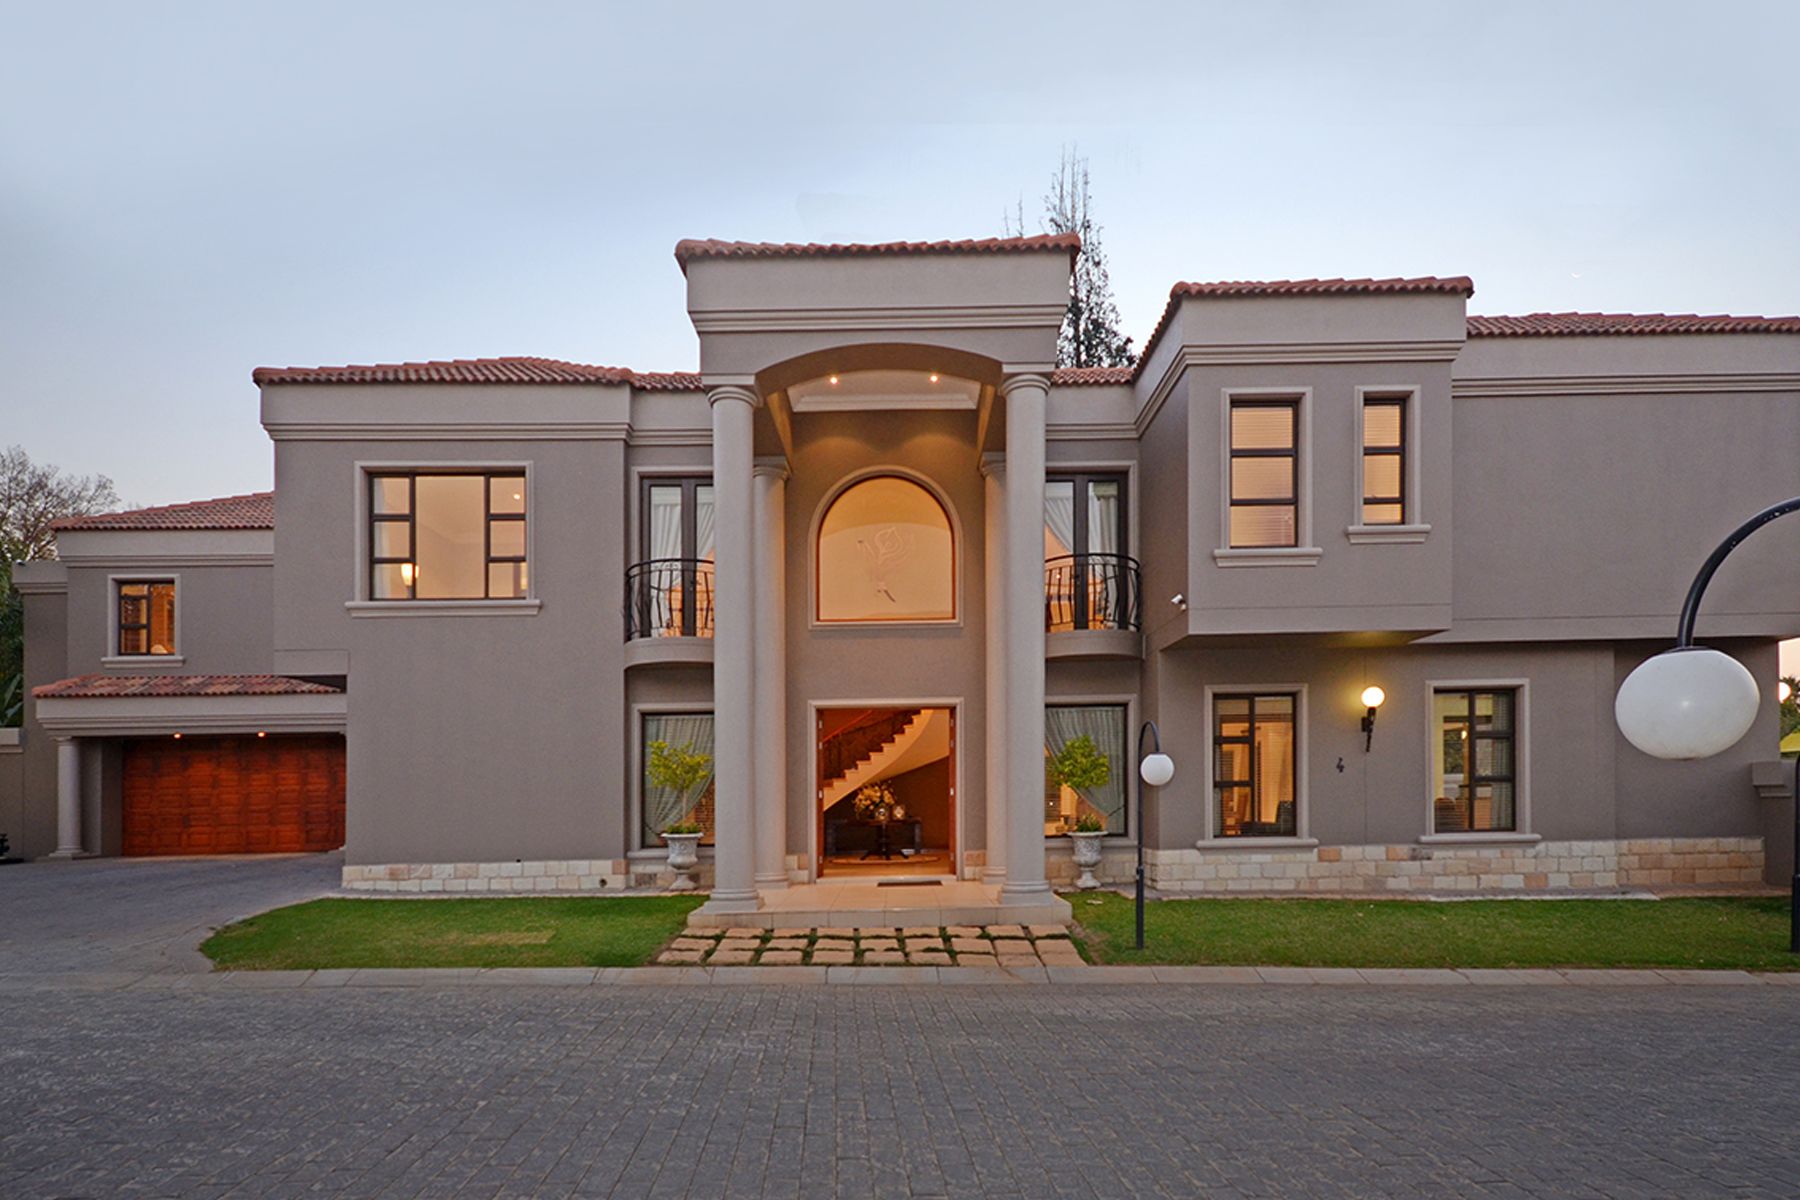 Single Family Home for Sale at Villa D'ORO, Oriel Johannesburg, Gauteng, 2007 South Africa